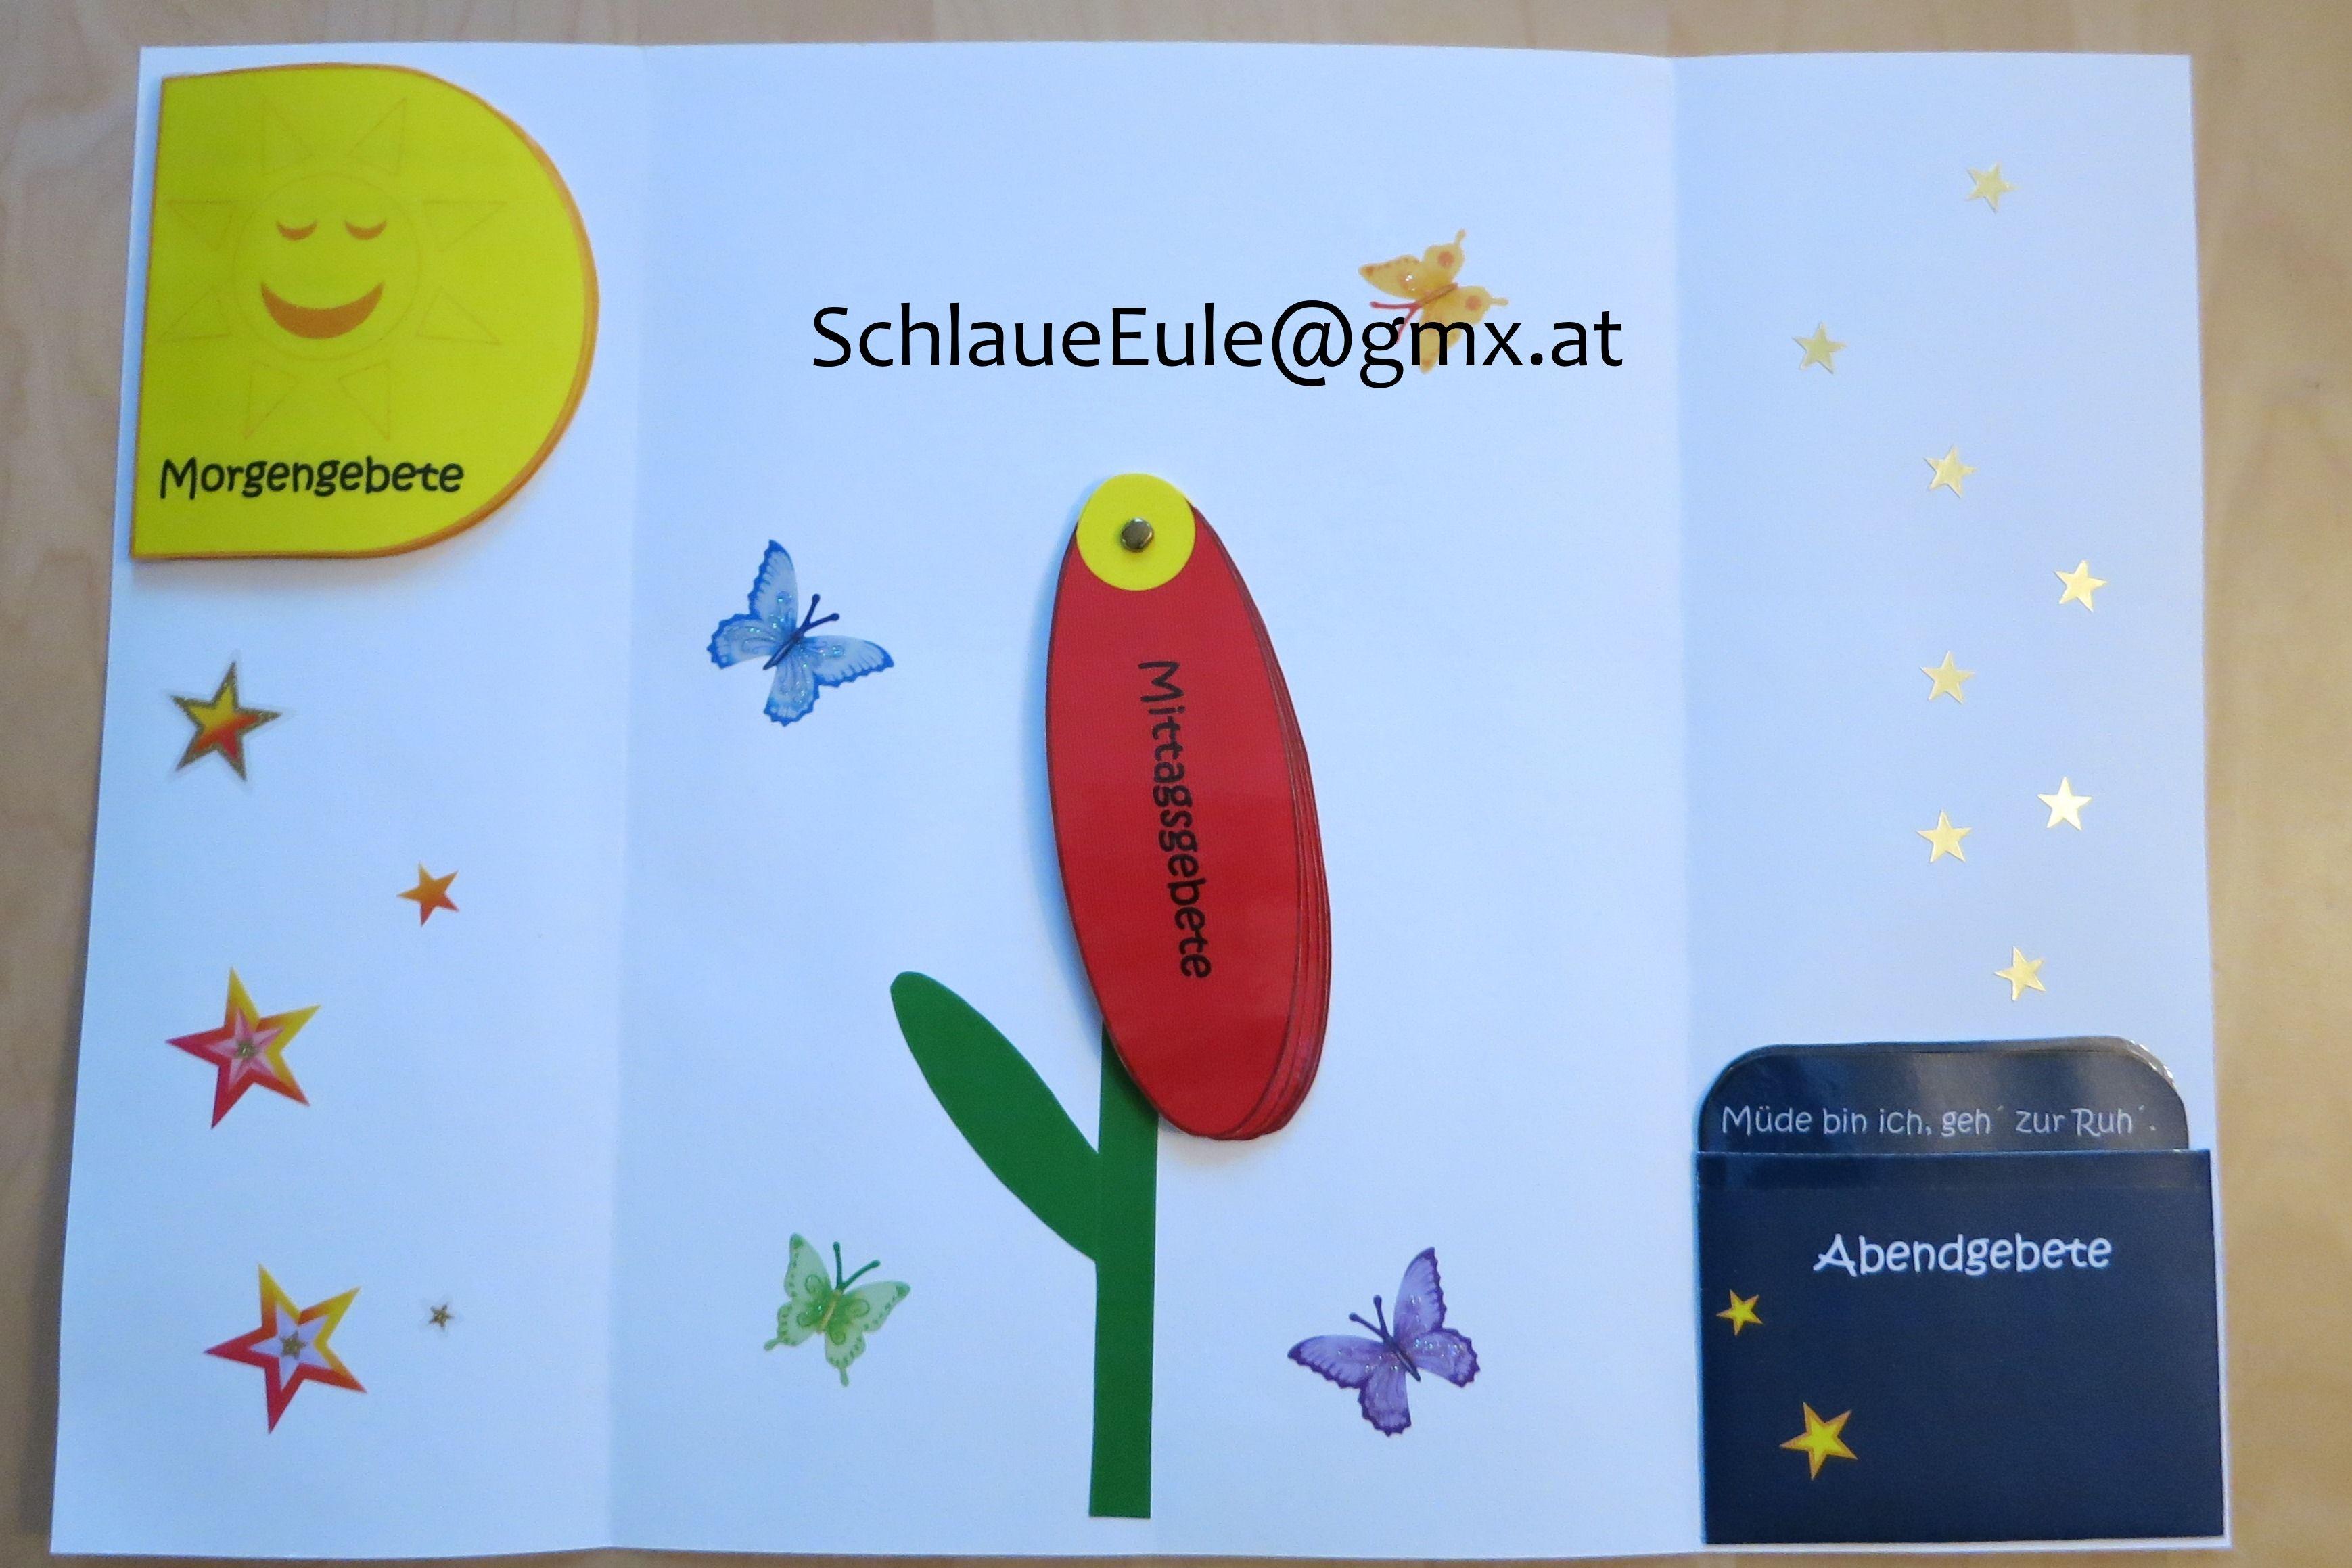 Tauf-Lapbook geschlossen | Taufe & Lapbook | Pinterest | Taufen